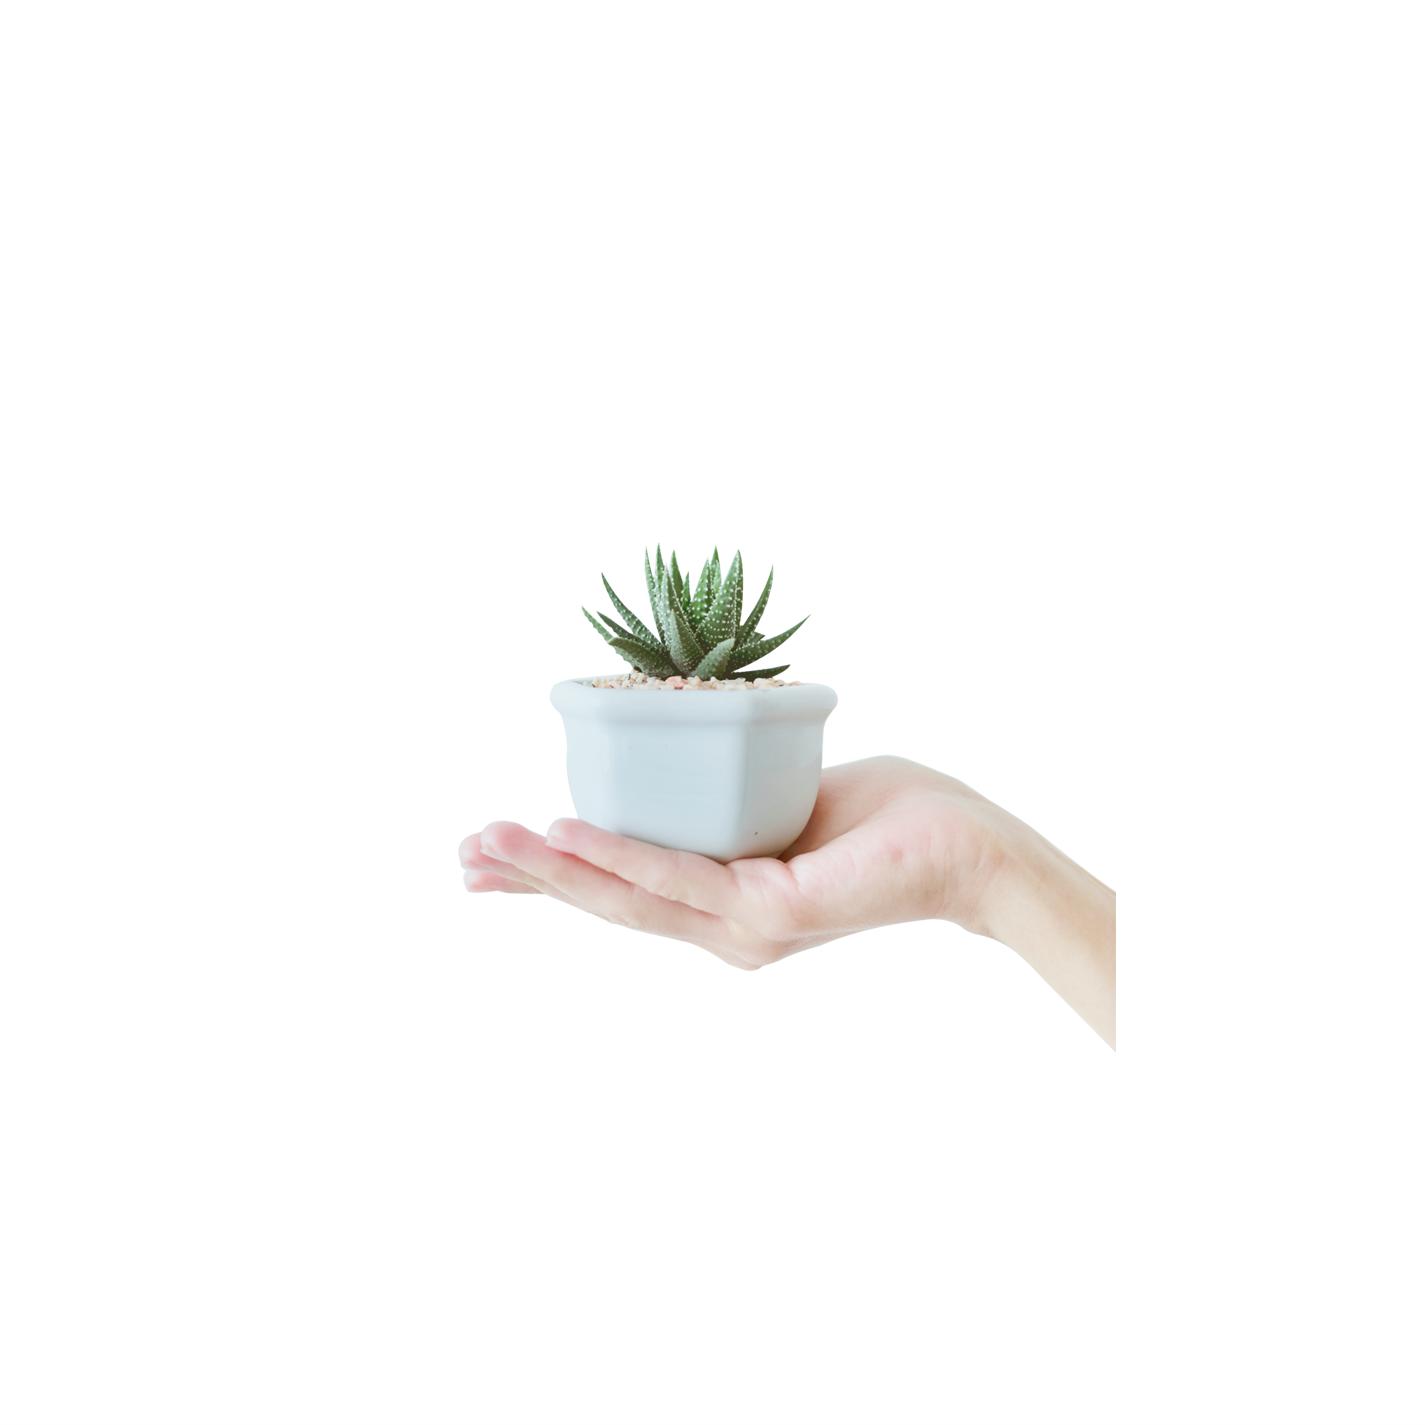 growth-image-4